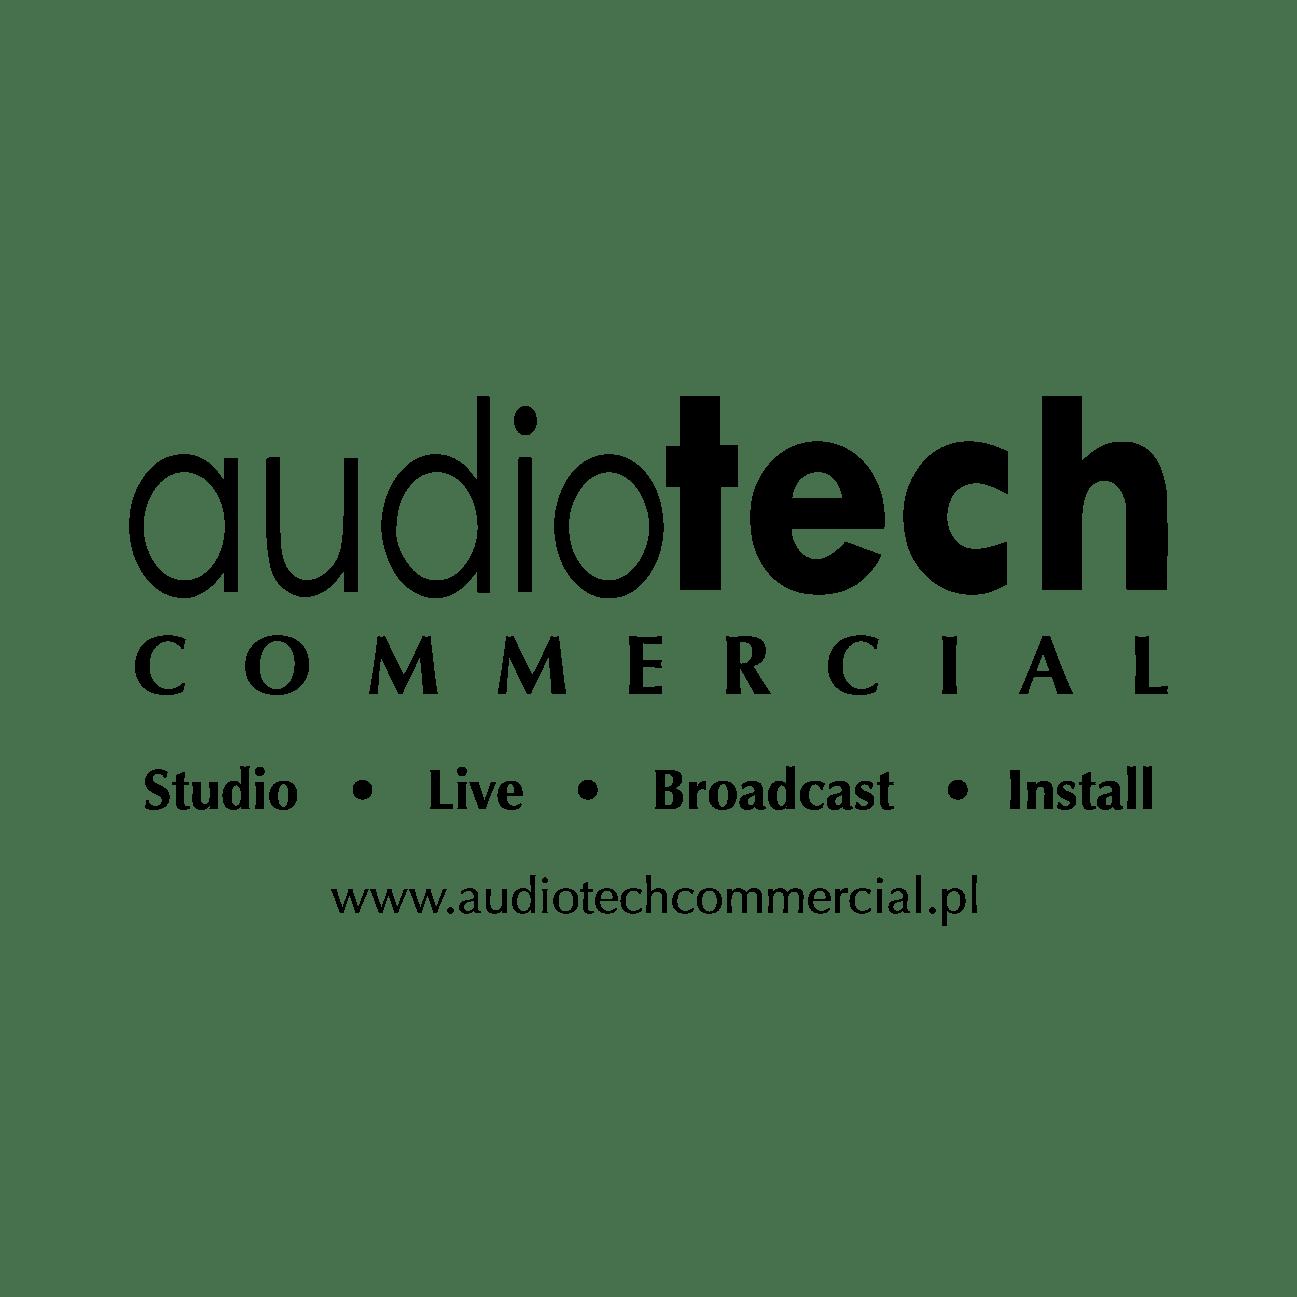 logo Audiotech Commercial S.C.